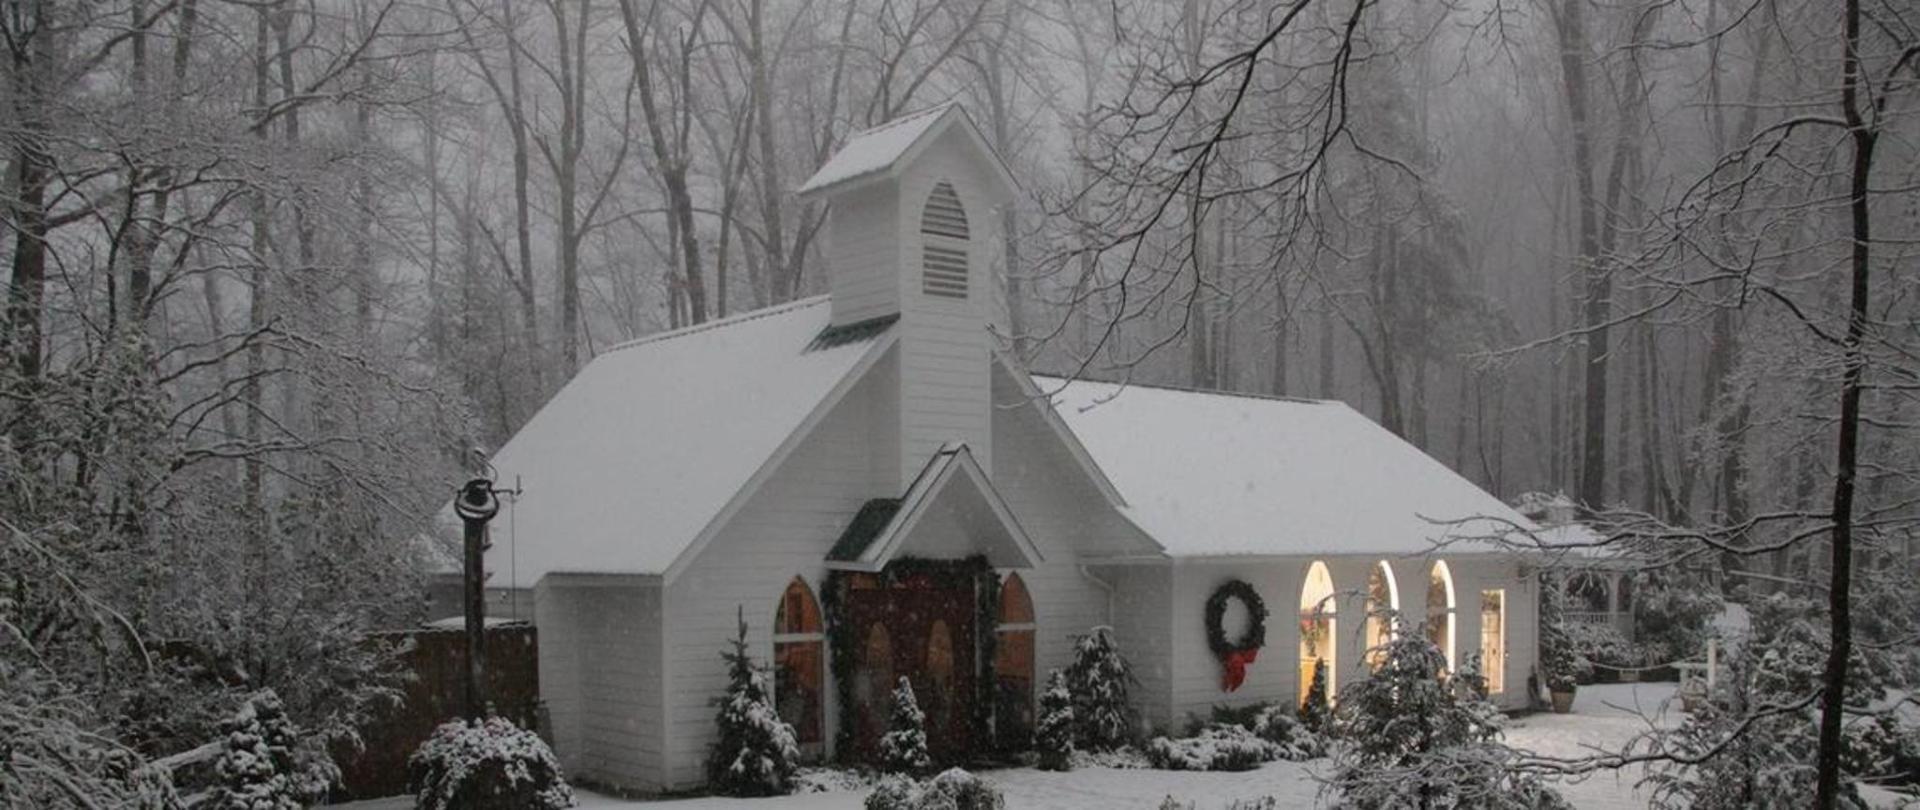 Winter Chapel In the Snow.jpg